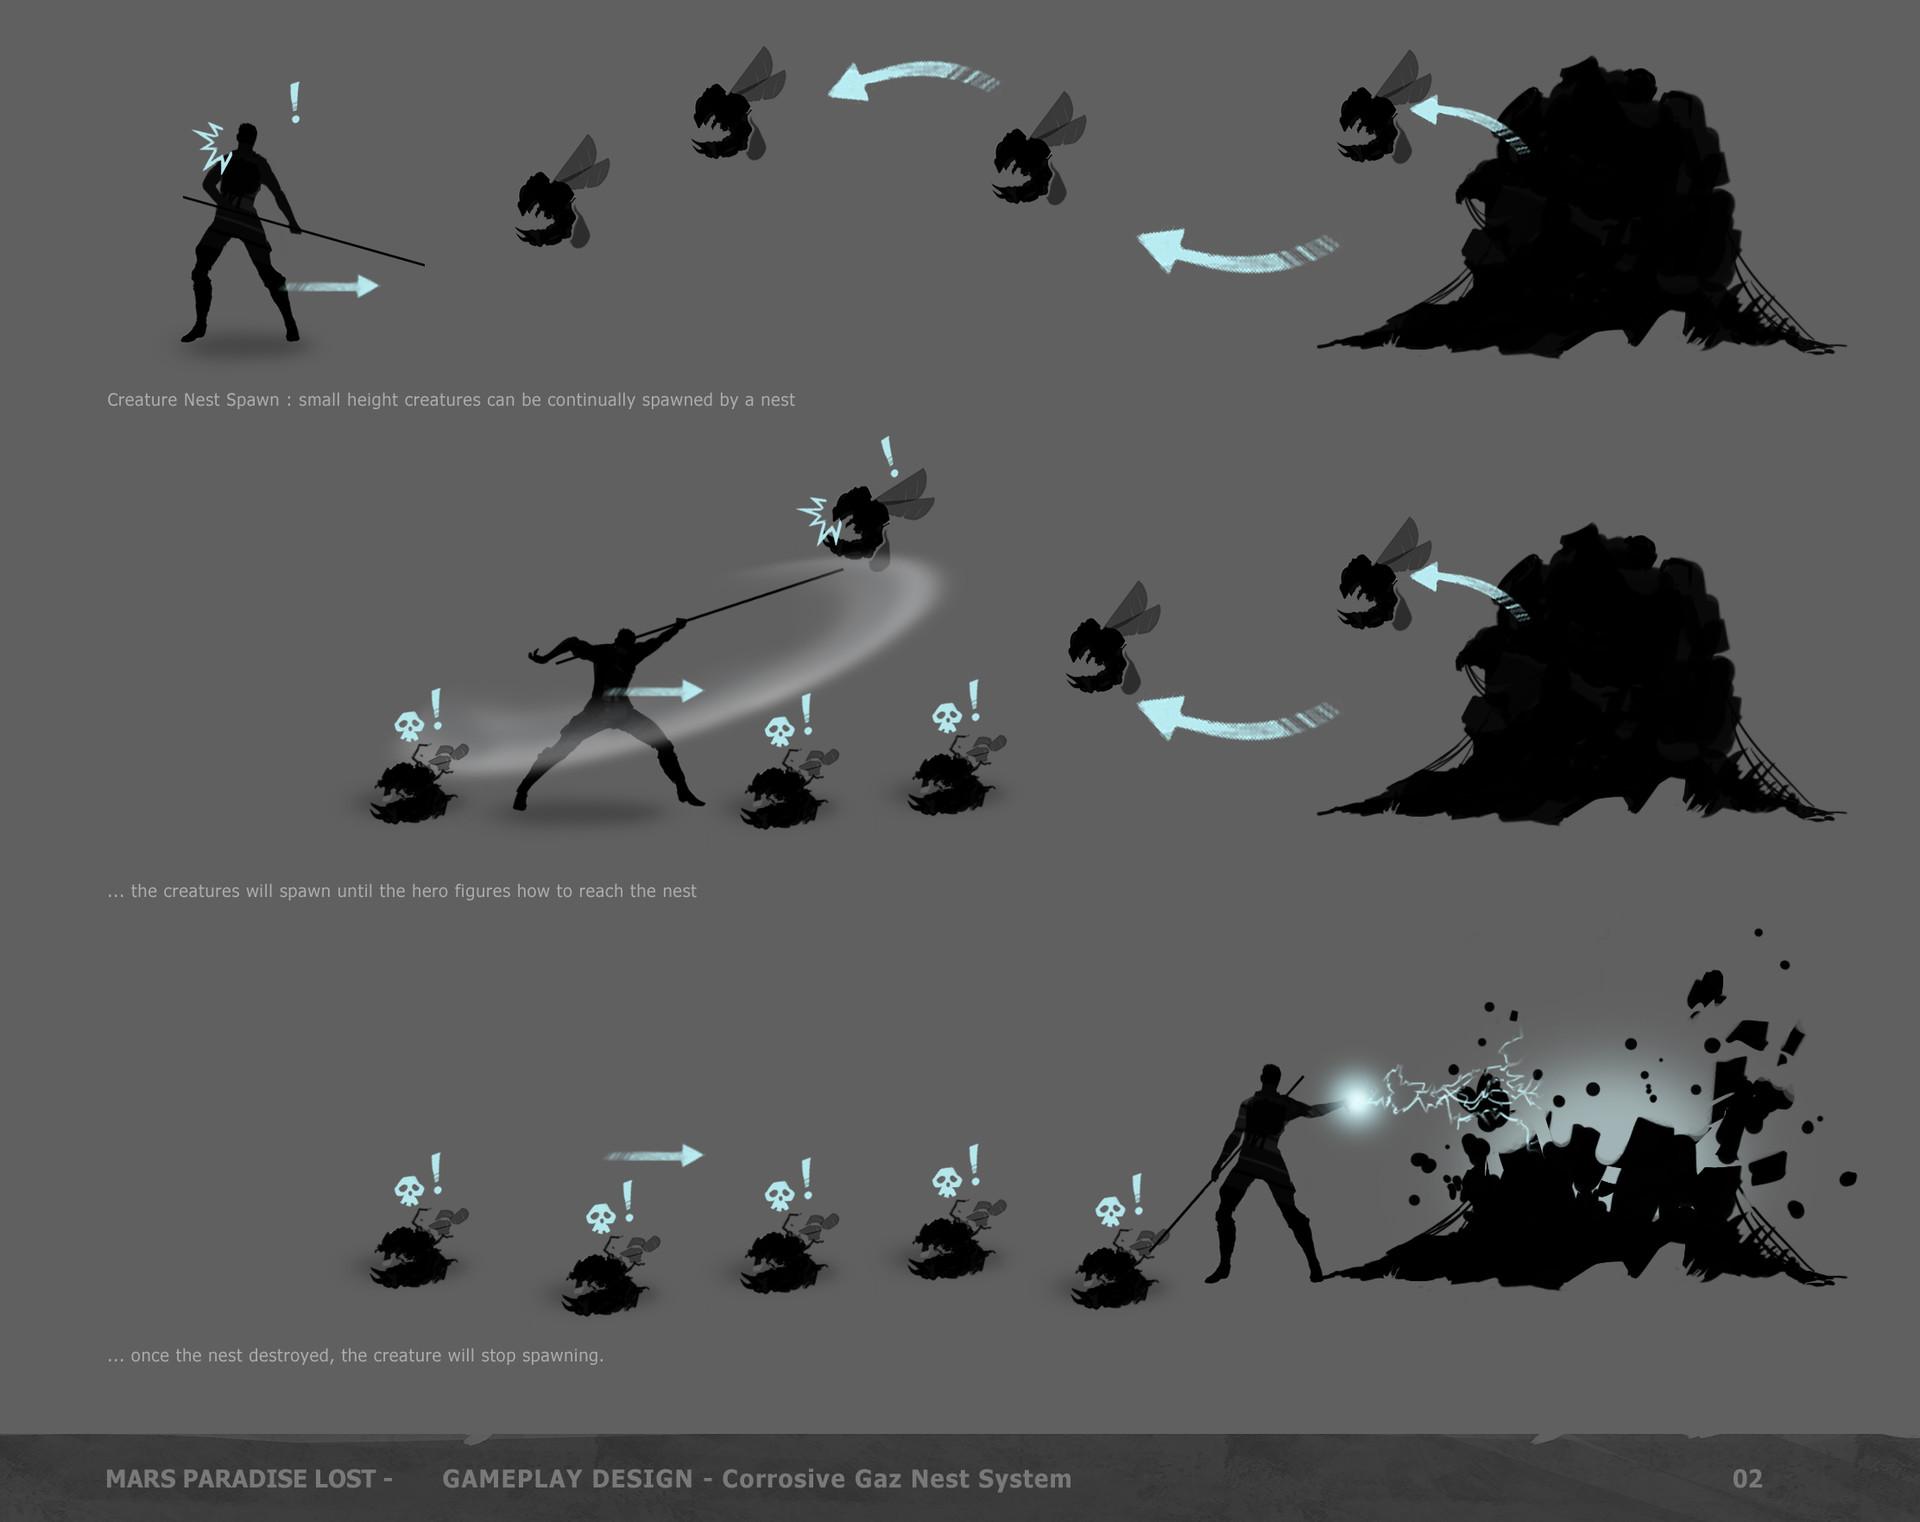 Alexandre chaudret mars2 gameplaydesign creature03b